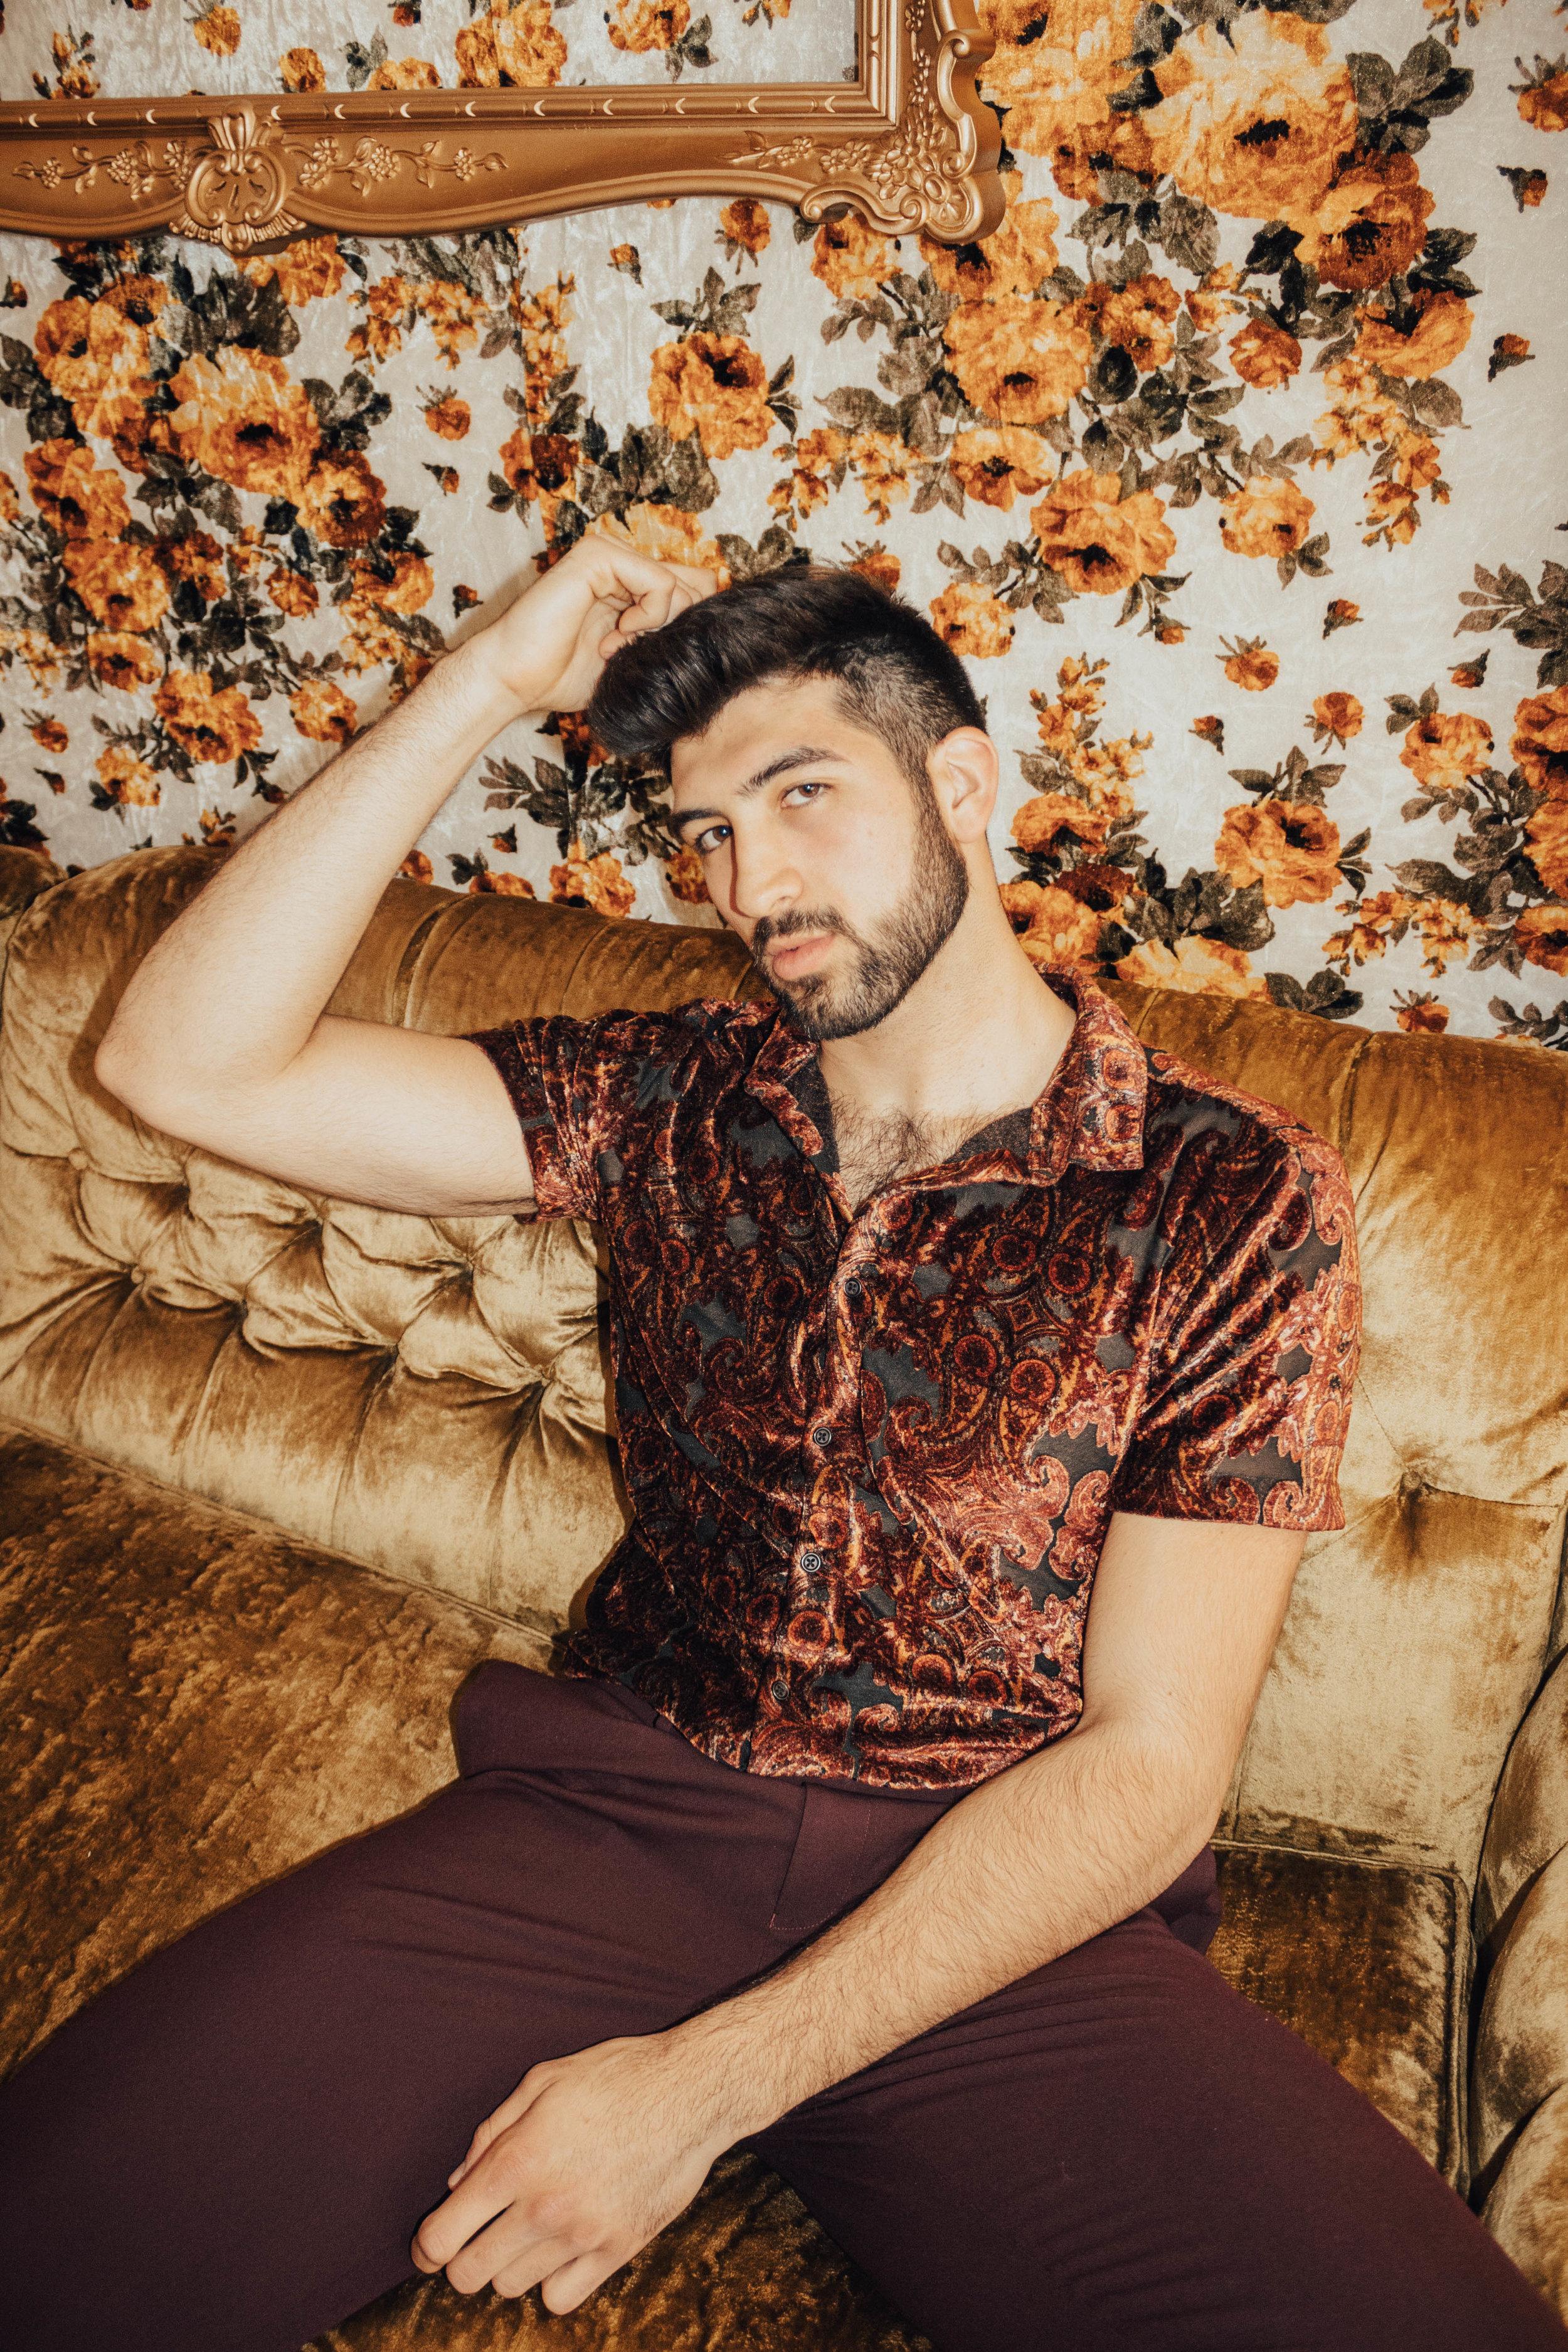 Alex Morehouse (photographer) Ben Romero (model)